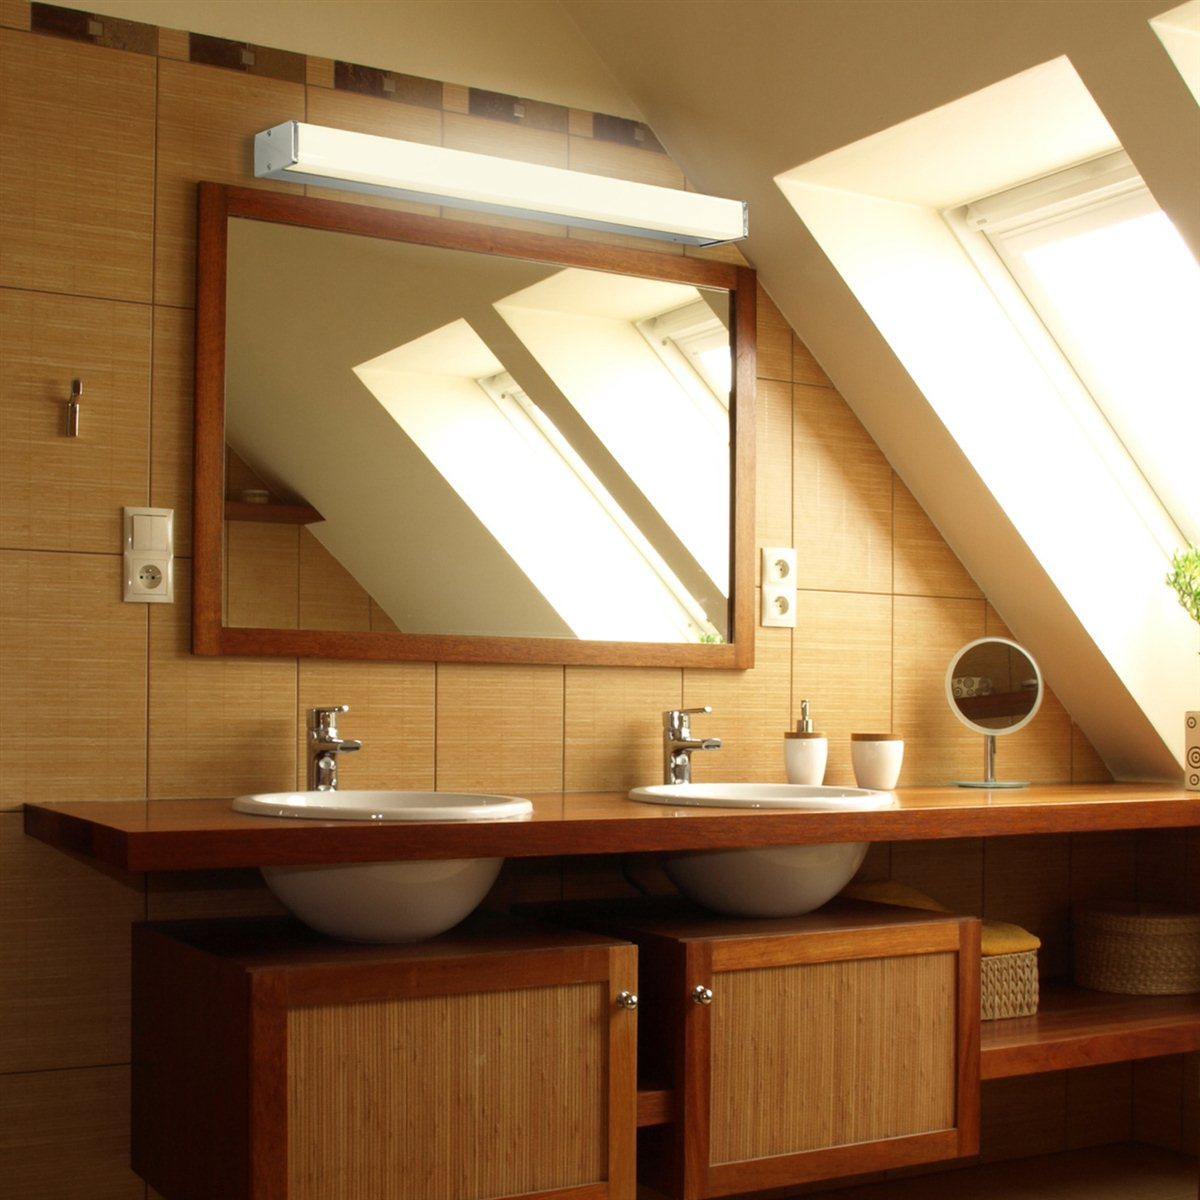 lampenlux wandlampe pico wandleuchte spiegelleuchte. Black Bedroom Furniture Sets. Home Design Ideas